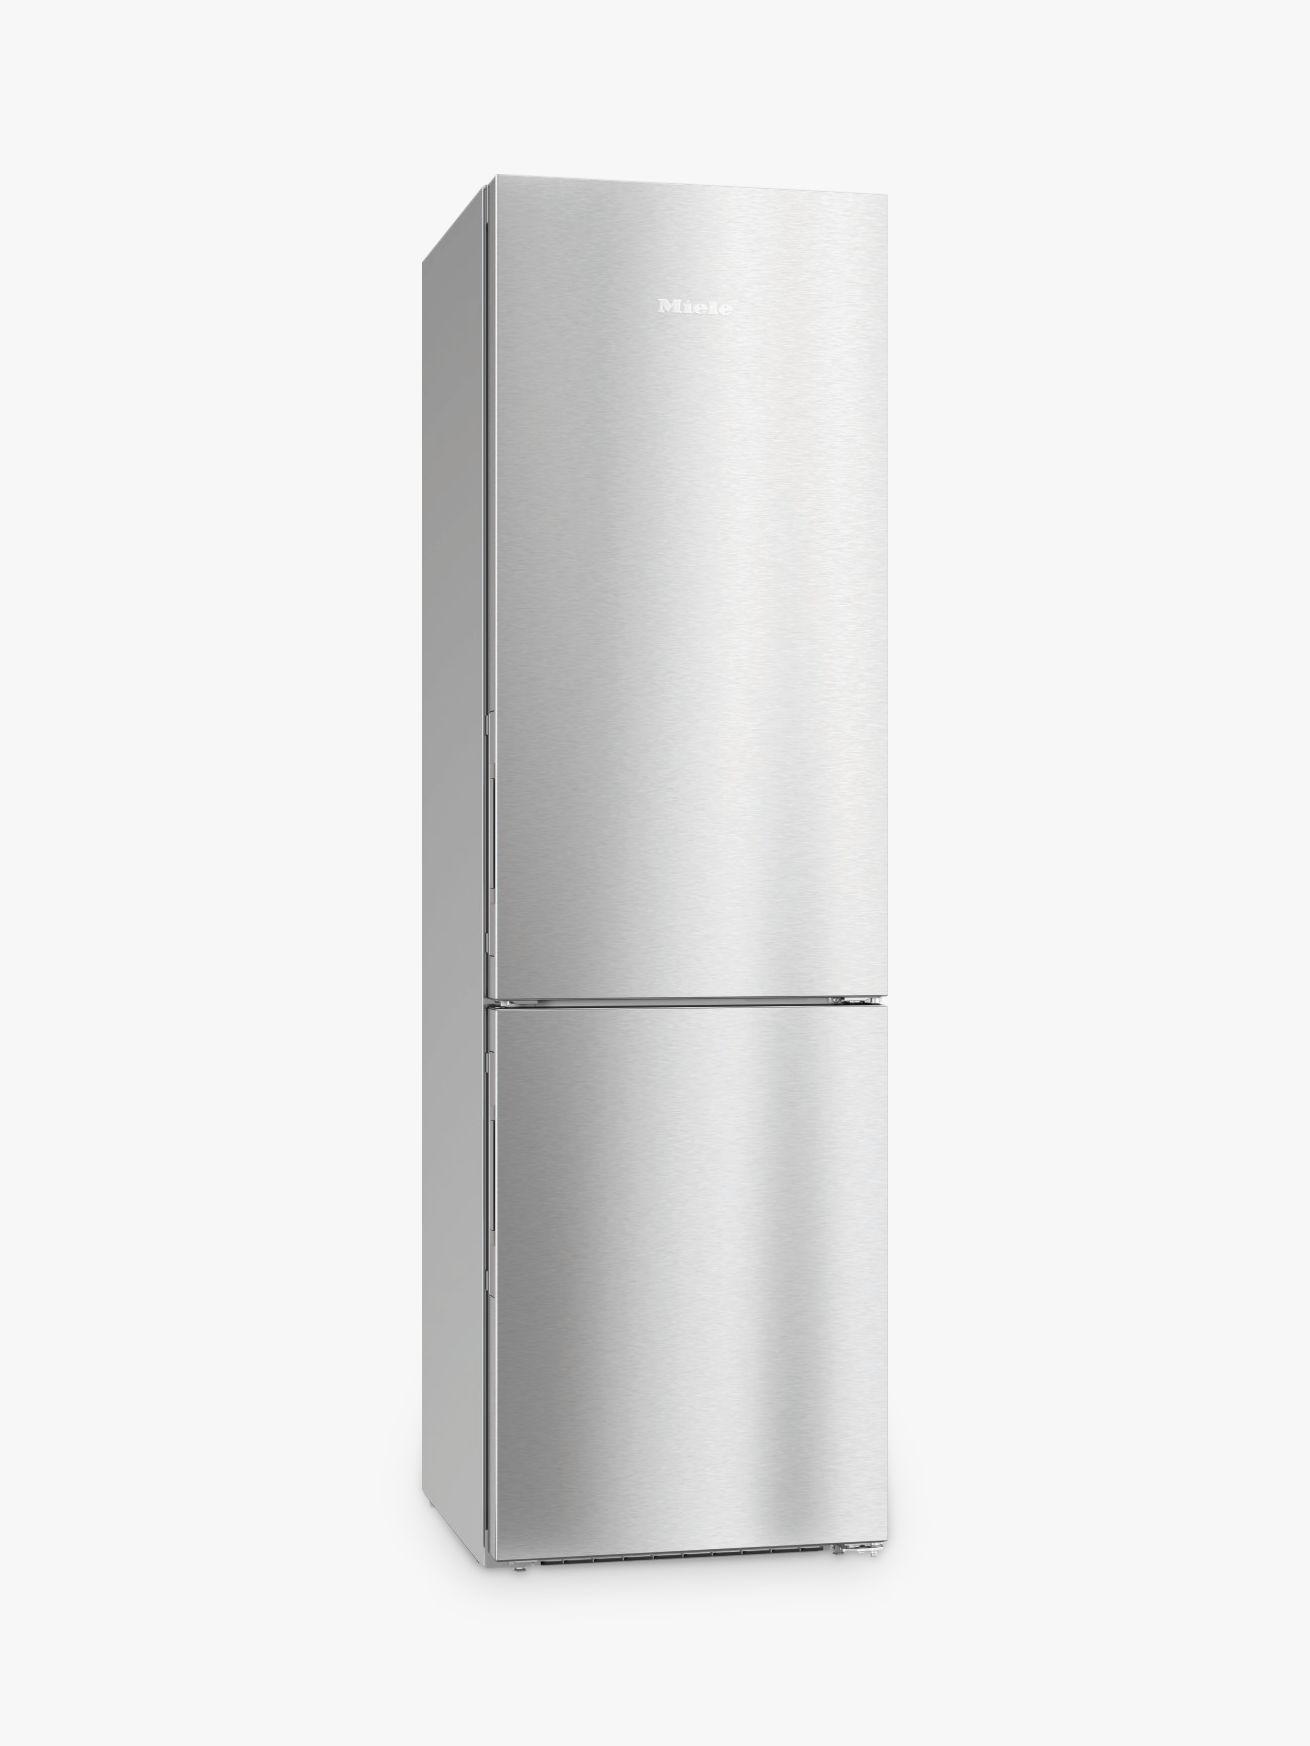 Miele Miele KFN29493DE Fridge Freezer, A+++ Energy Rating, 60cm Wide, Stainless Steel